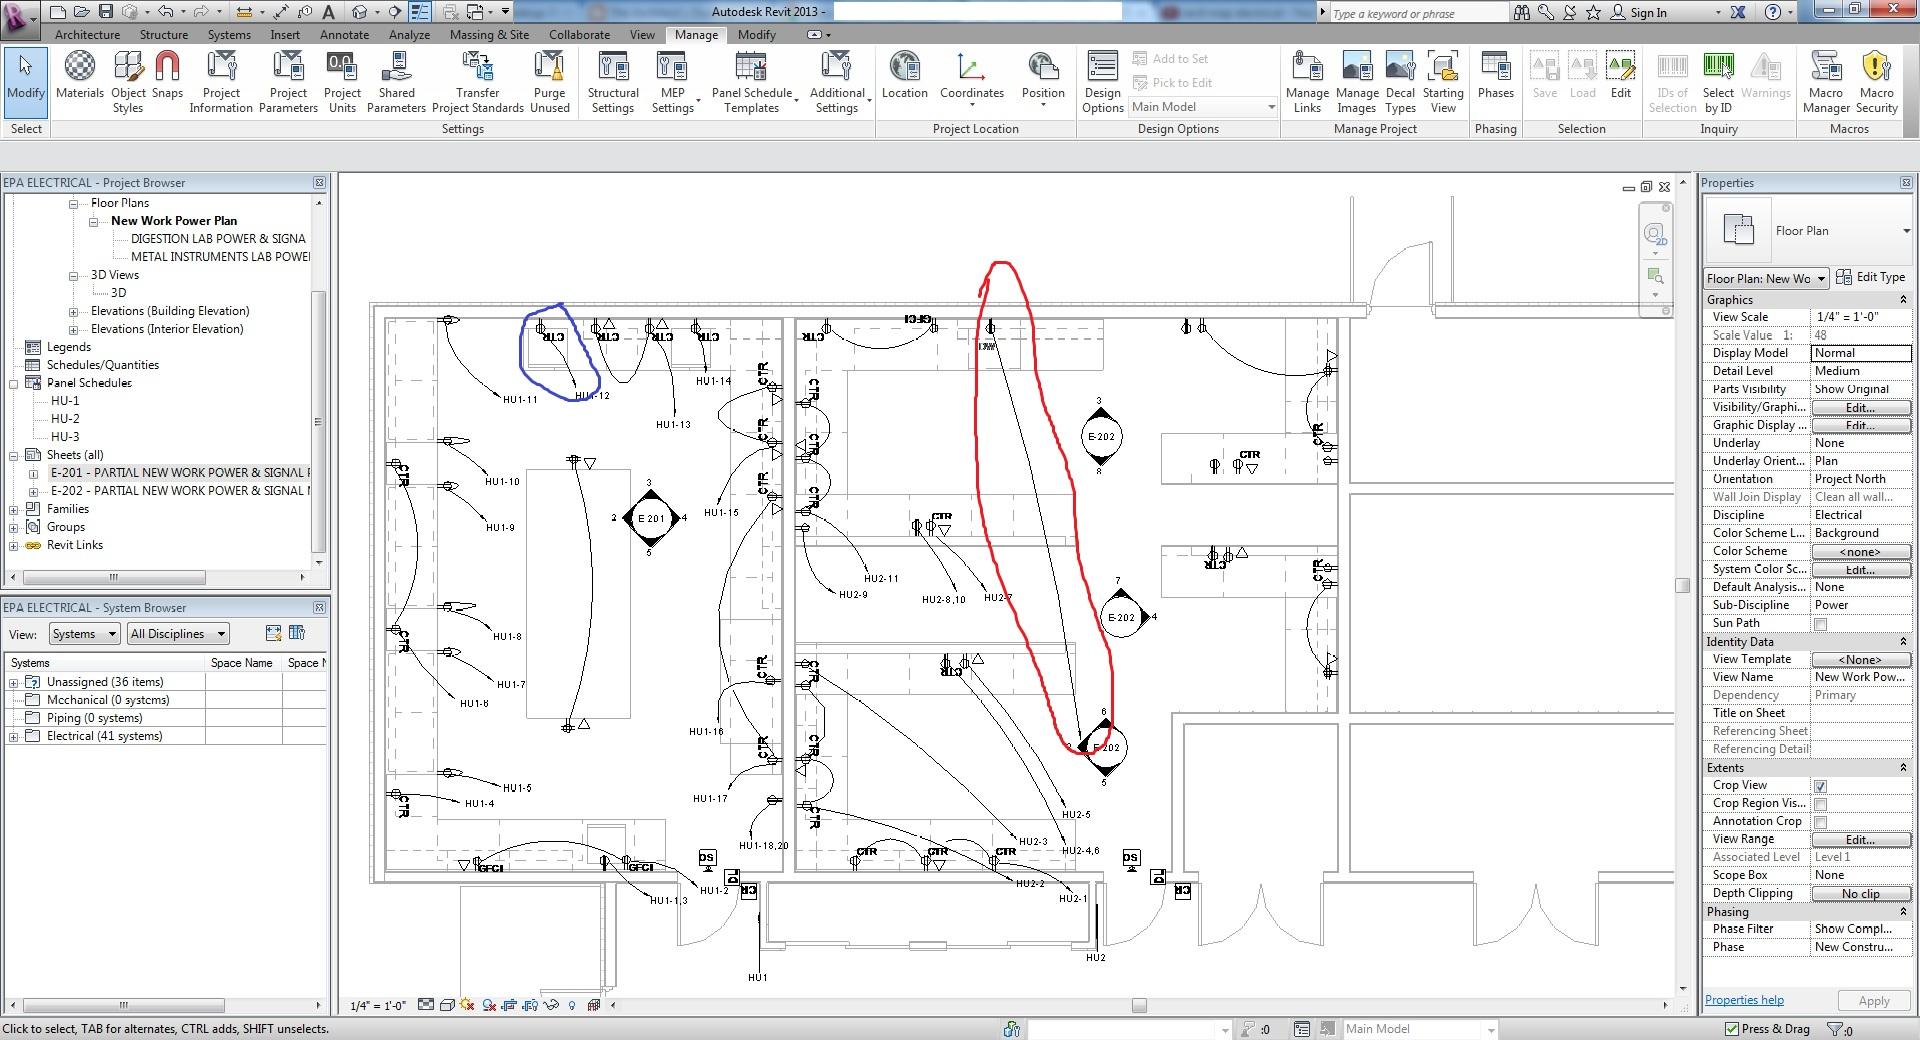 109647_home_run?resize\\\\\\\\\\\\\\\\\\\\\\\\\\\\\\\\\\\\\\\\\\\\\\\\\\\\\\\\\\\\\\\=665%2C360 gnx fleetmatics wiring diagram wiring diagram images fleetmatics wiring diagram at bakdesigns.co